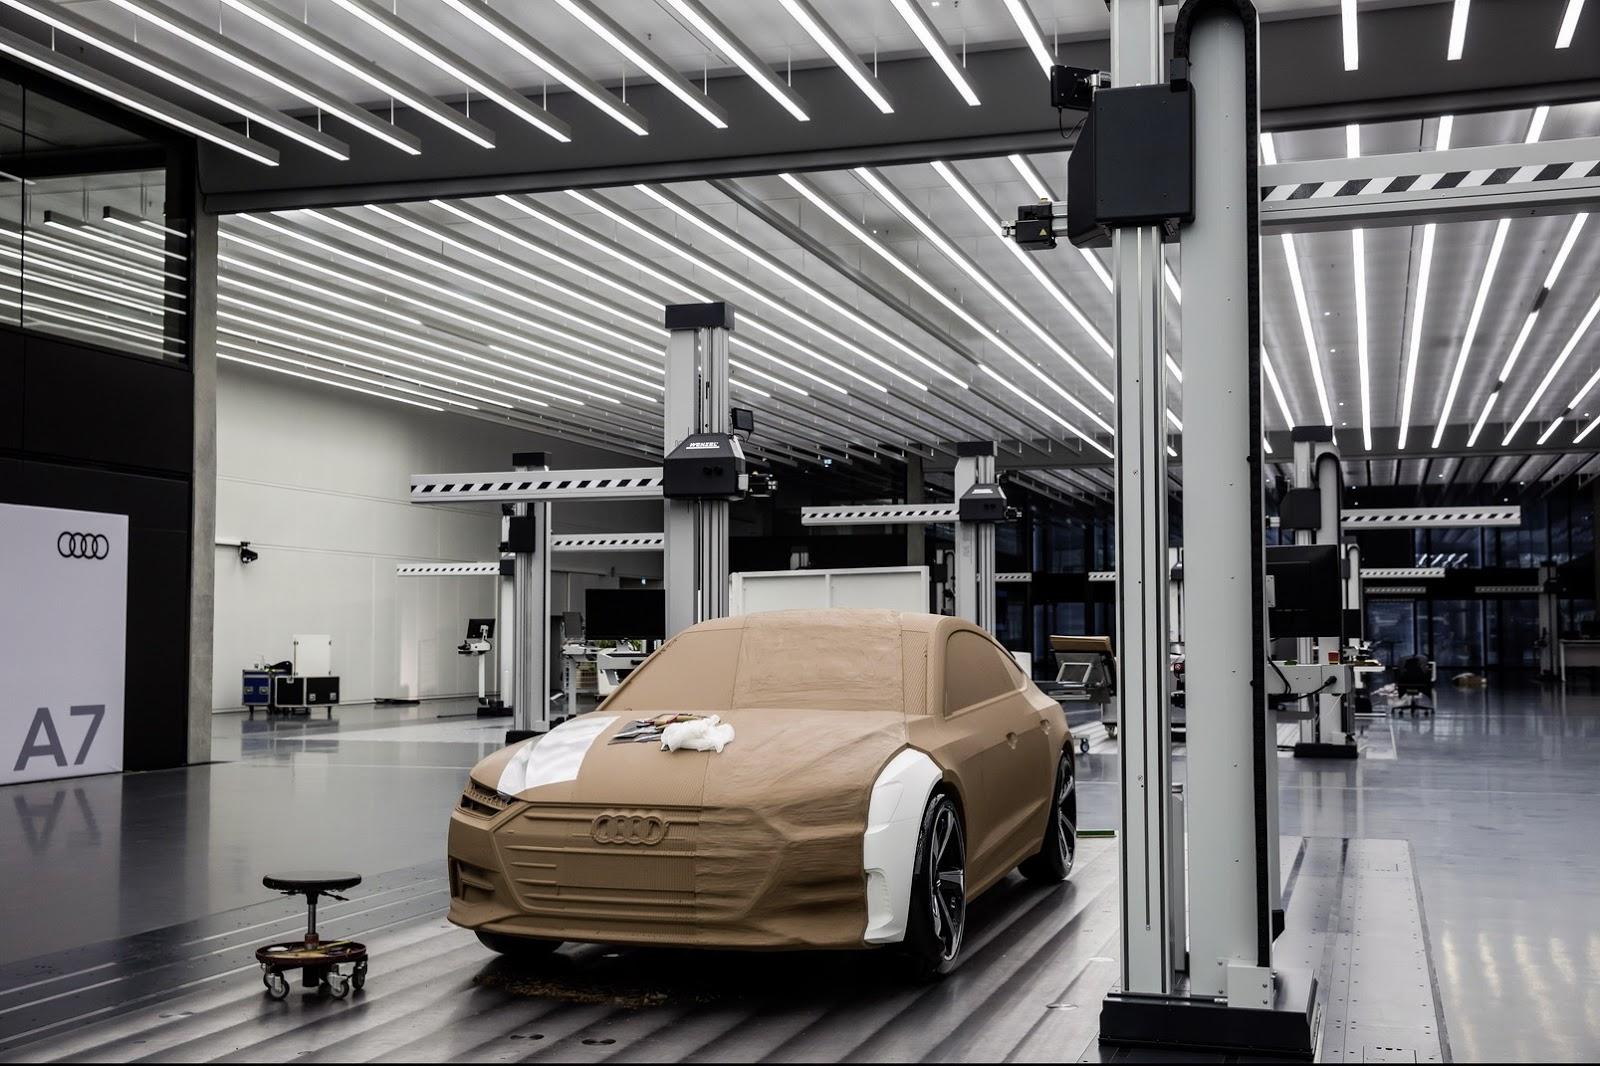 2018_Audi_A7_Sportback_0030